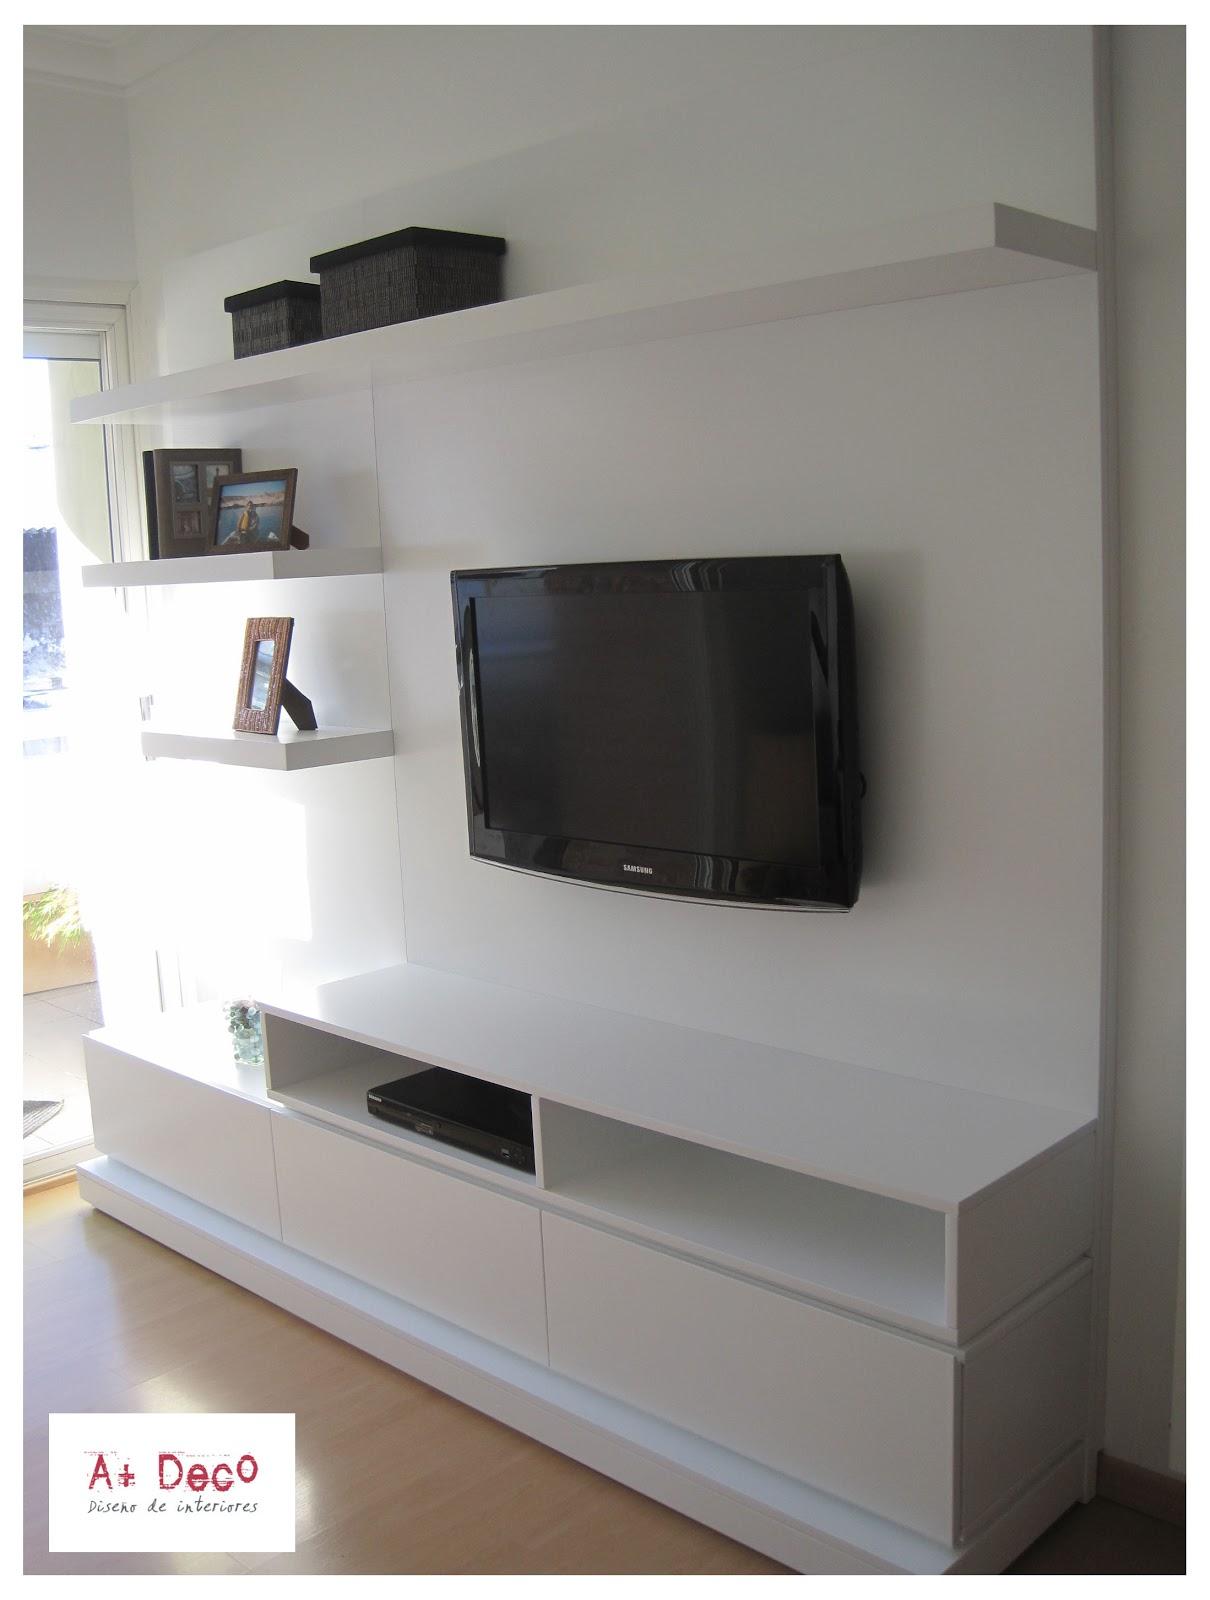 A deco marzo 2011 for Muebles de pared para living